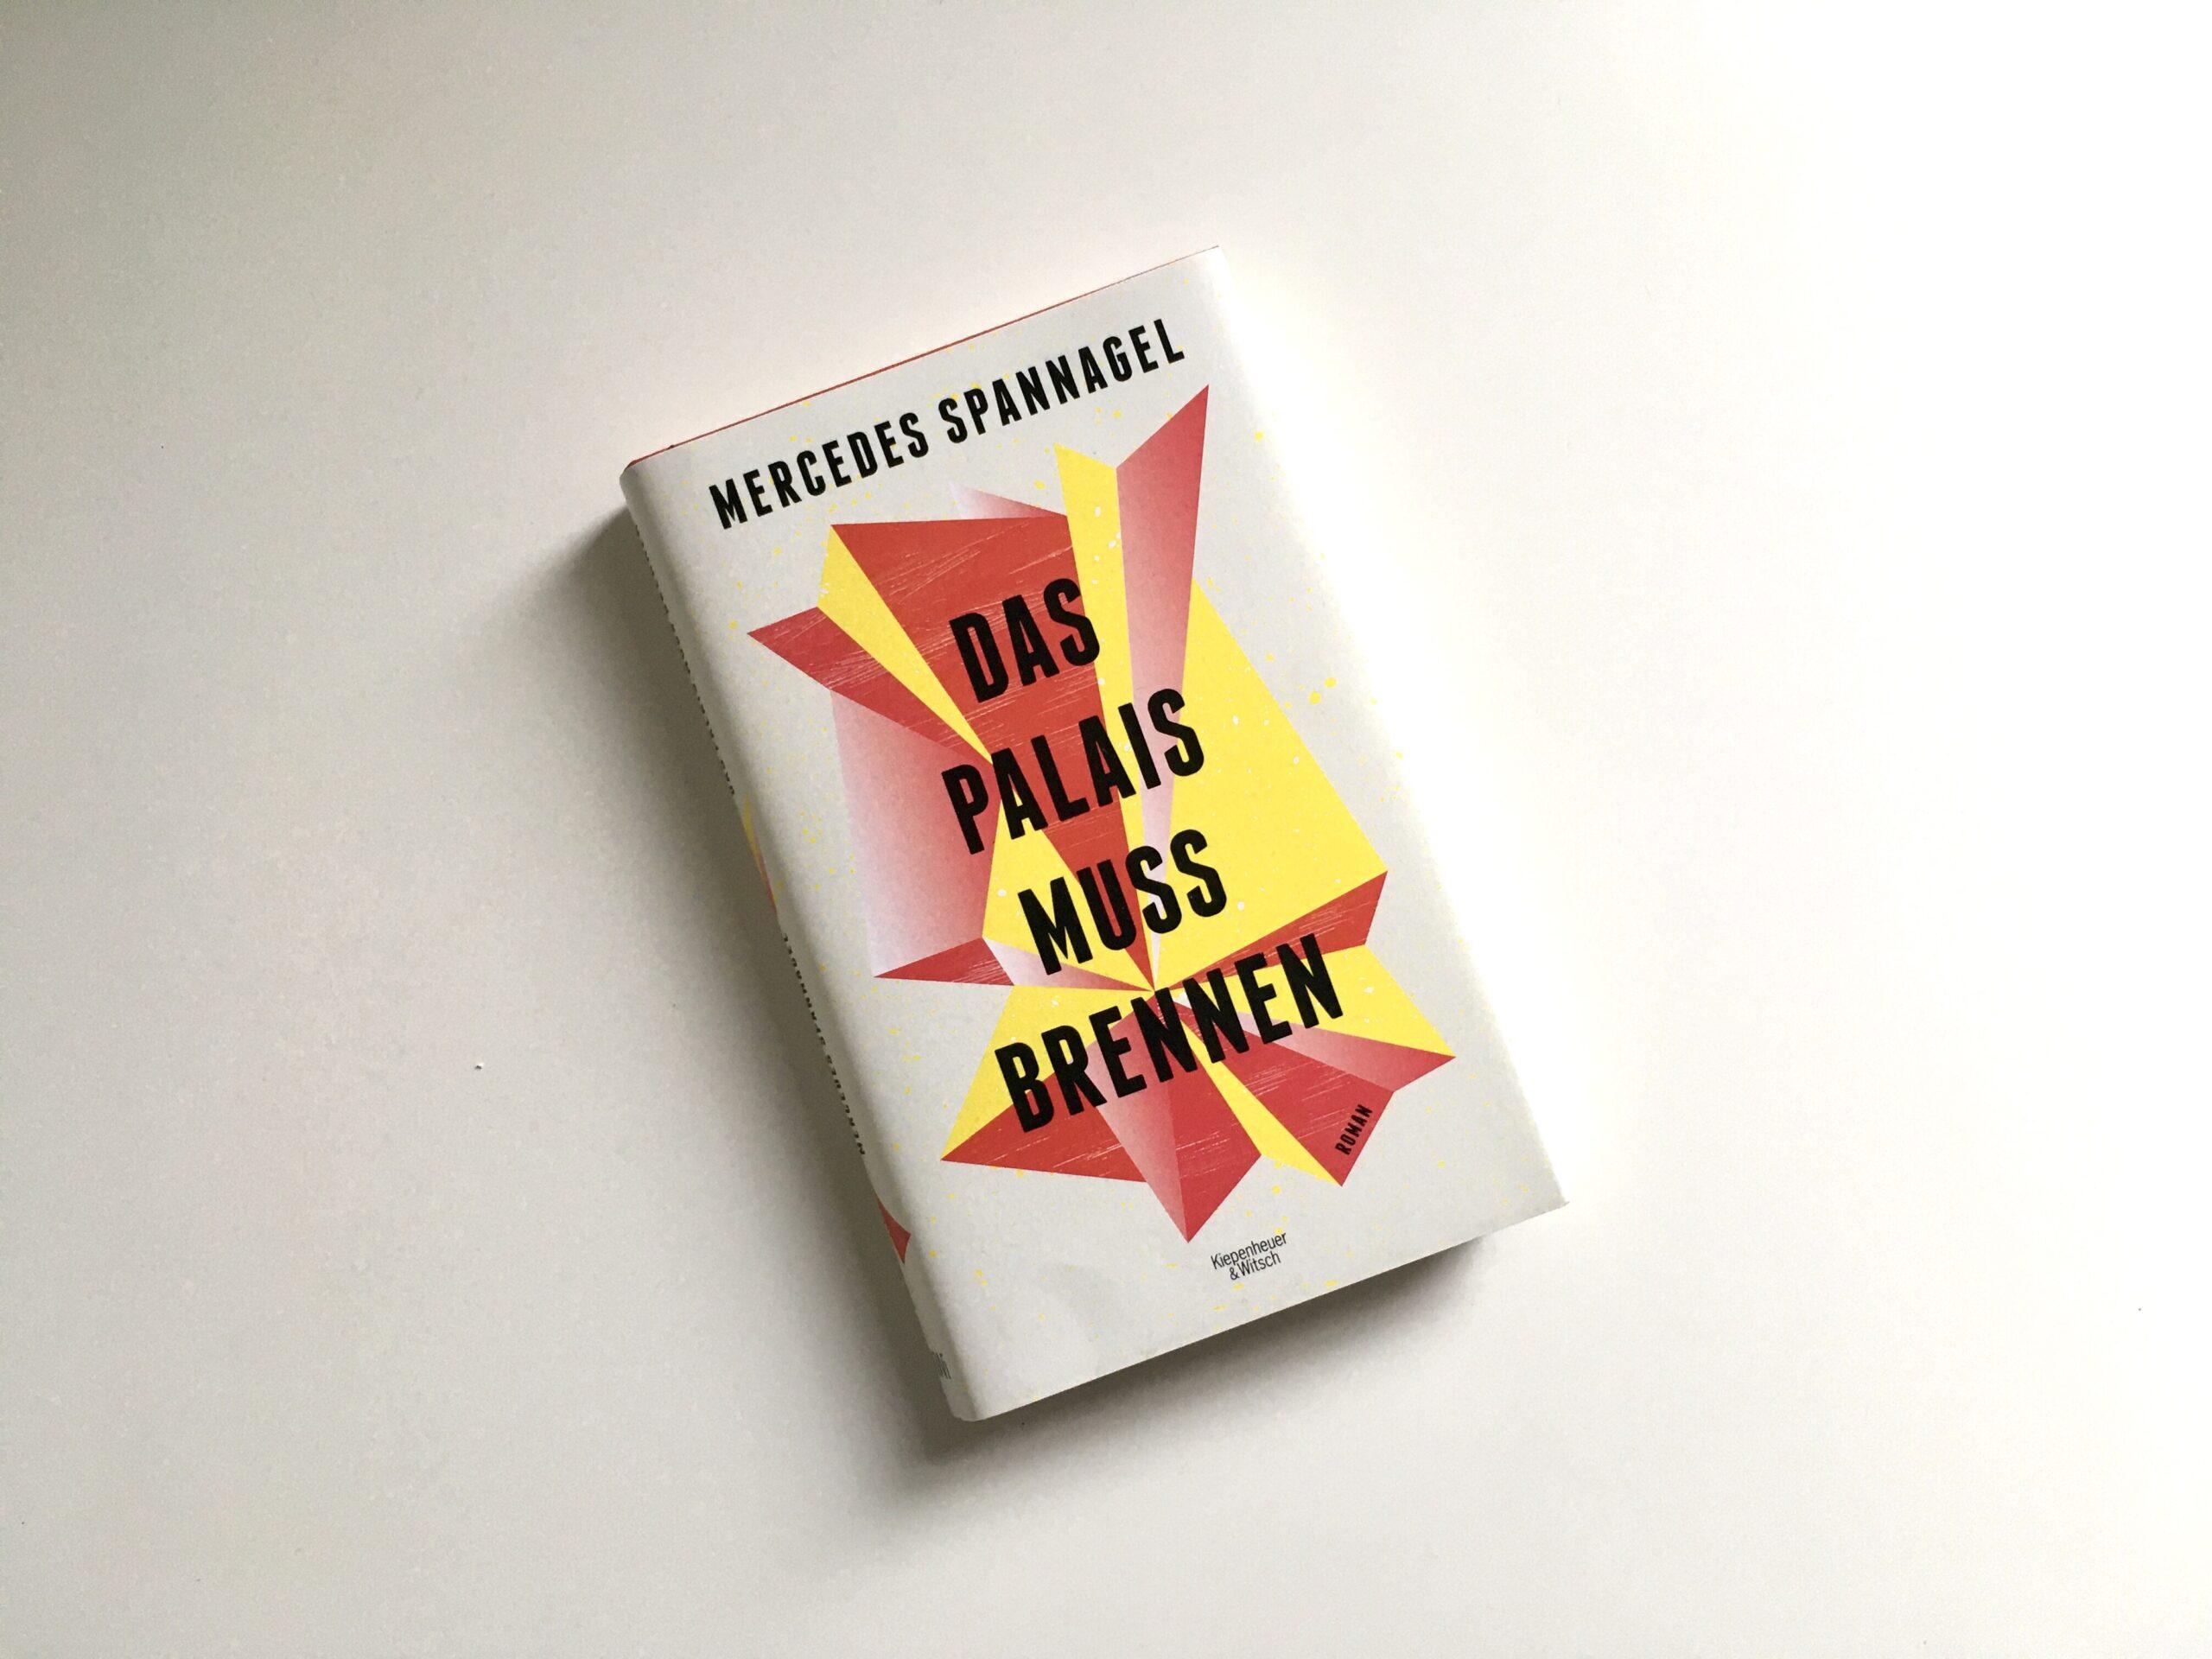 Mercedes Spannagel: Palais